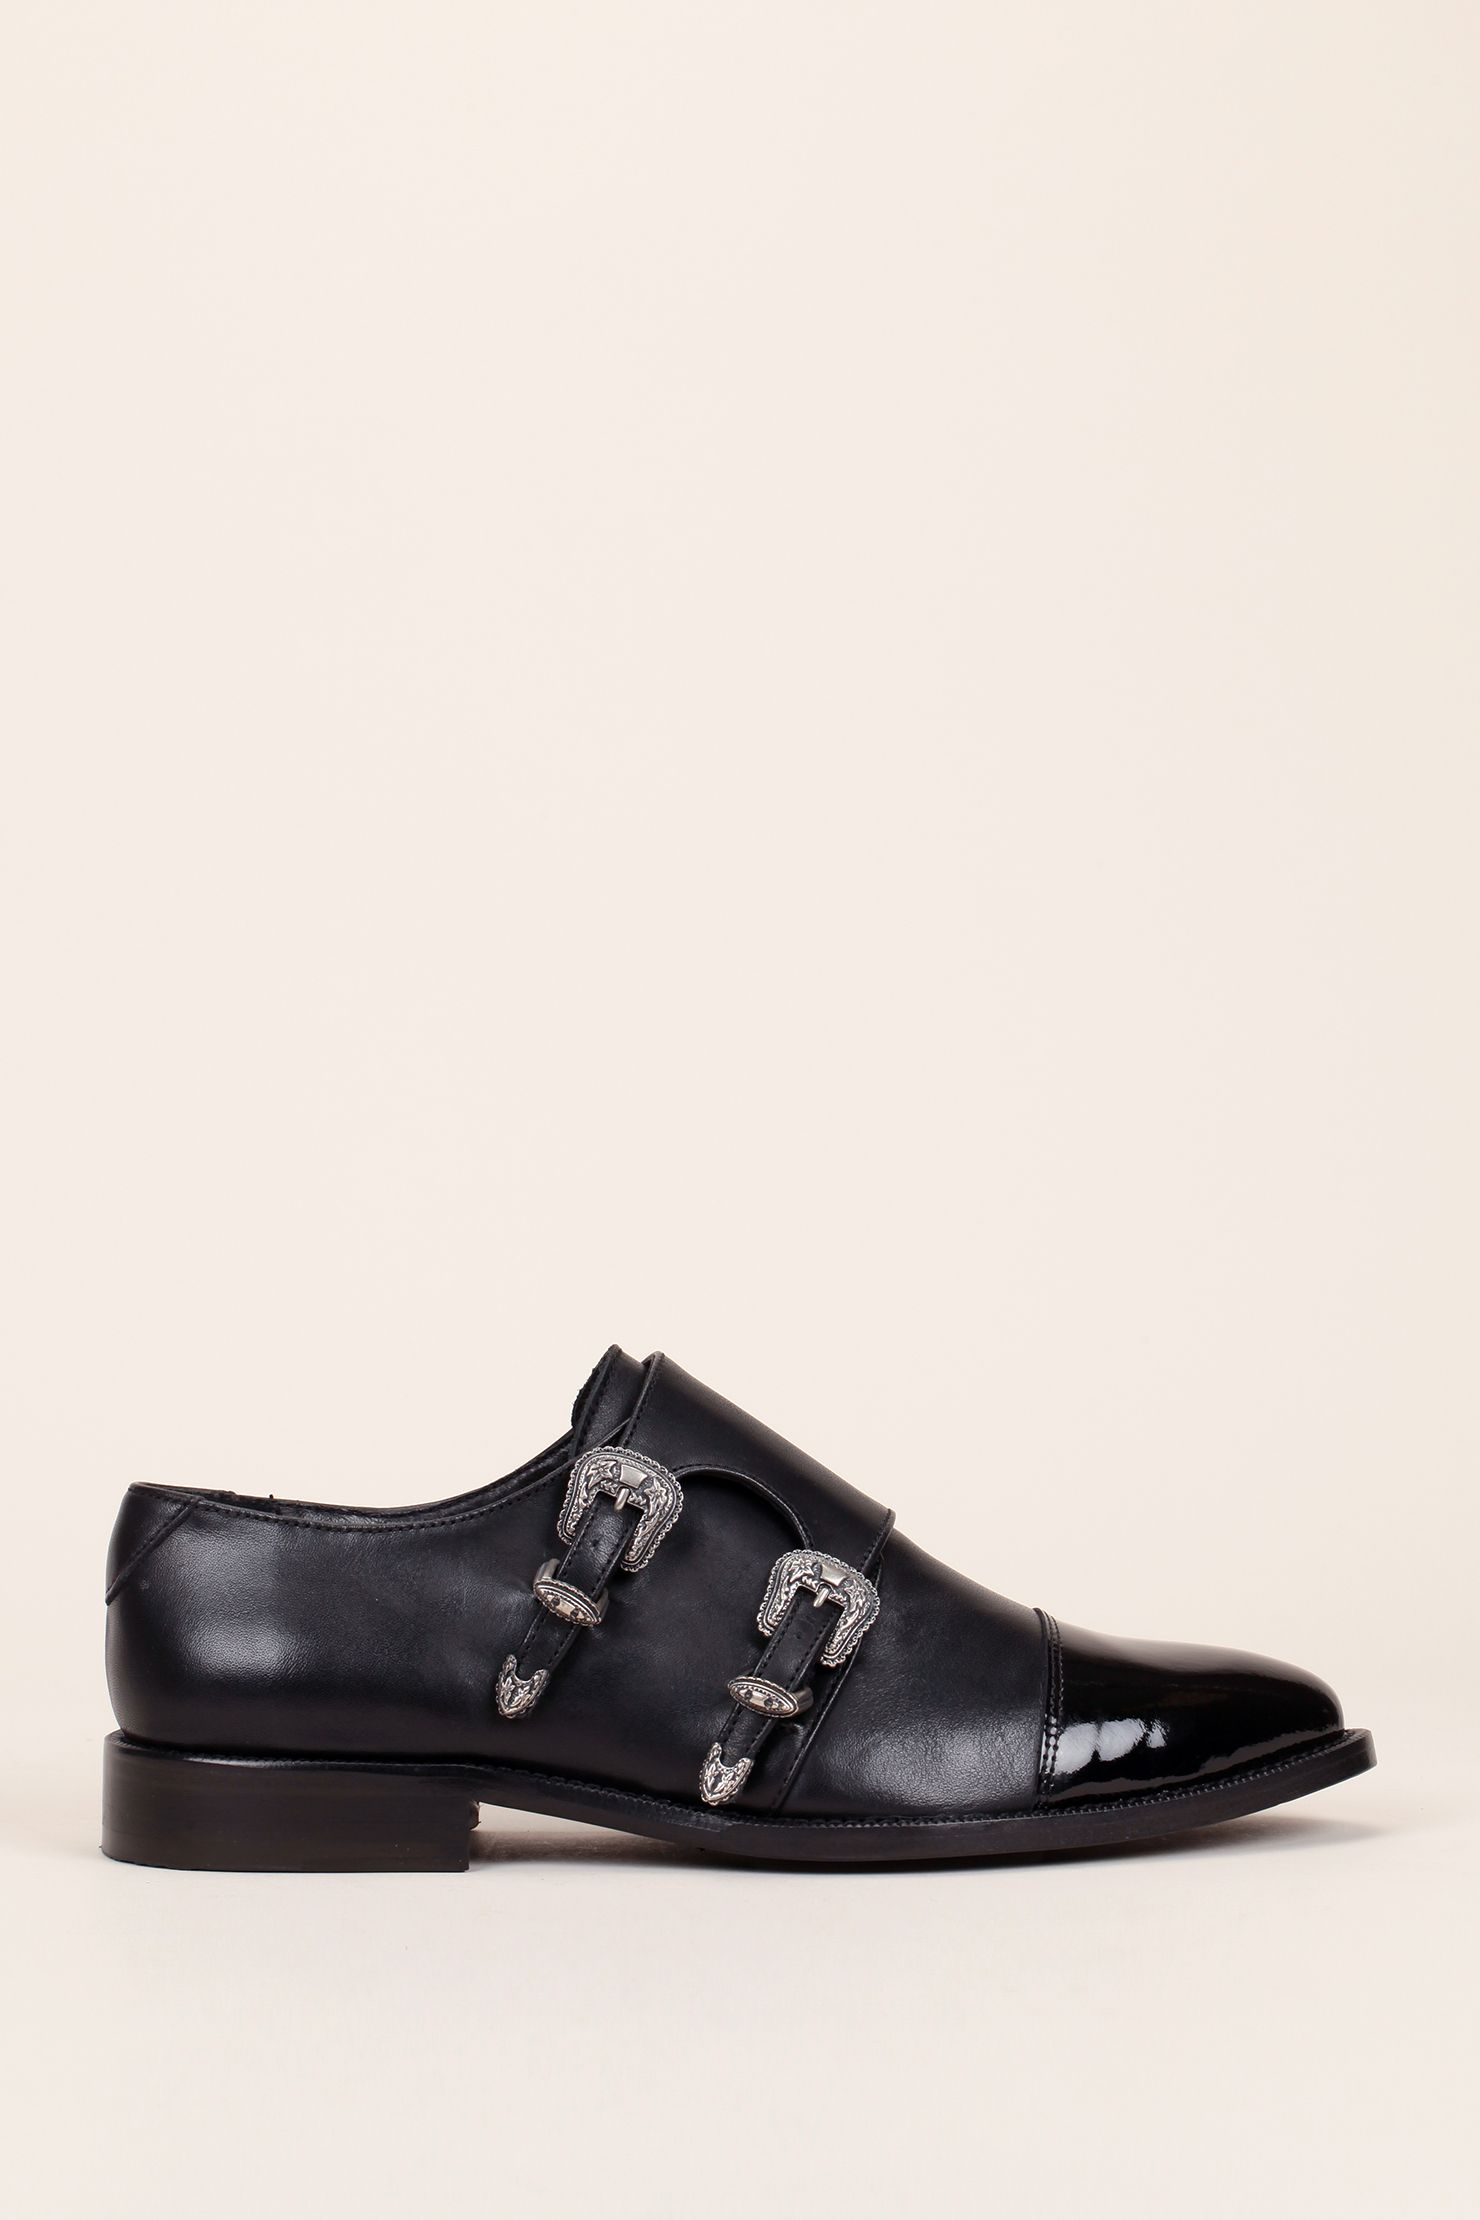 Chaussures Womens En Vente Dans La Sortie, Noir, Cuir, 2017, 36 37,5 Valentino